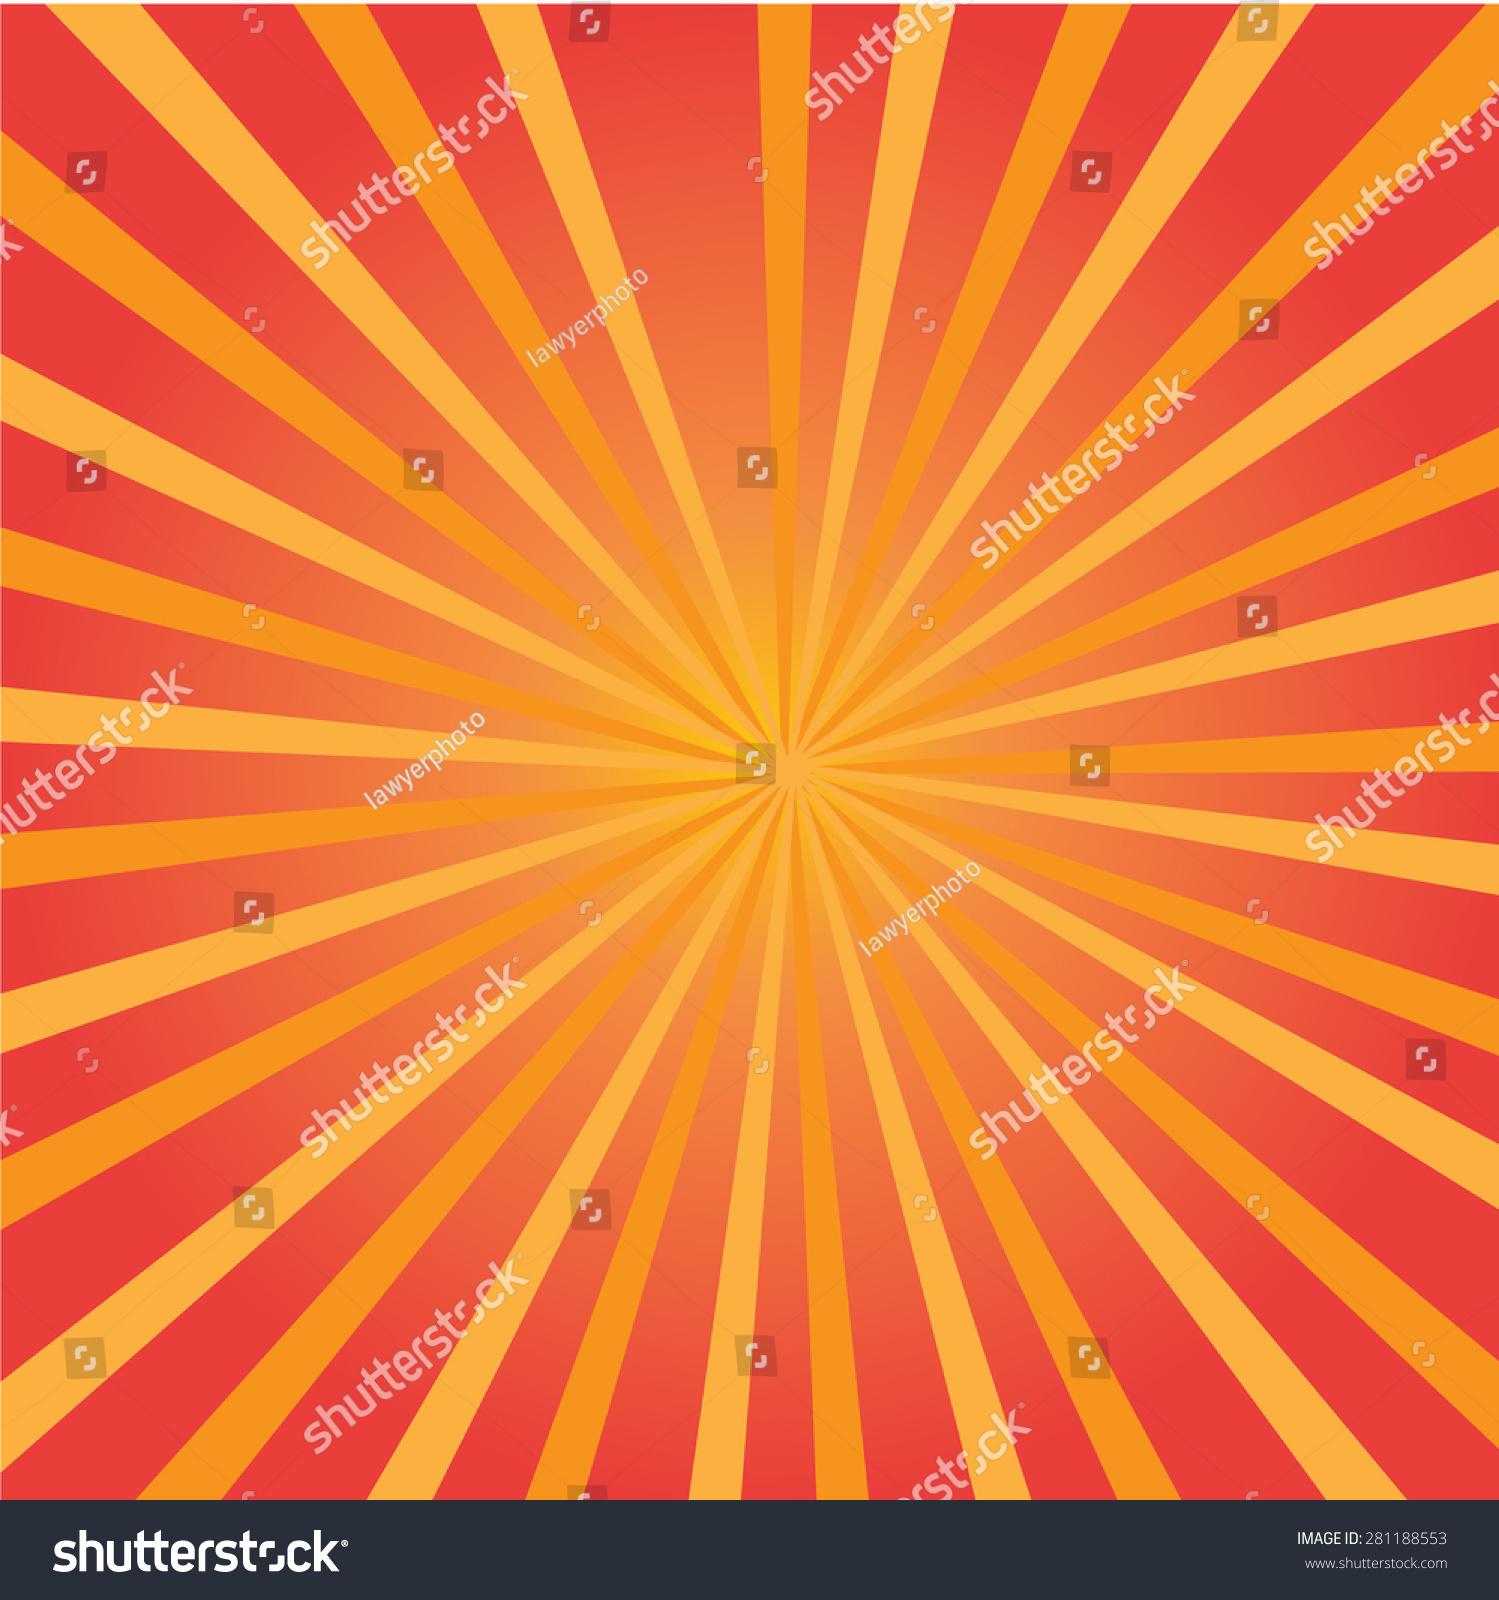 Sunray Background